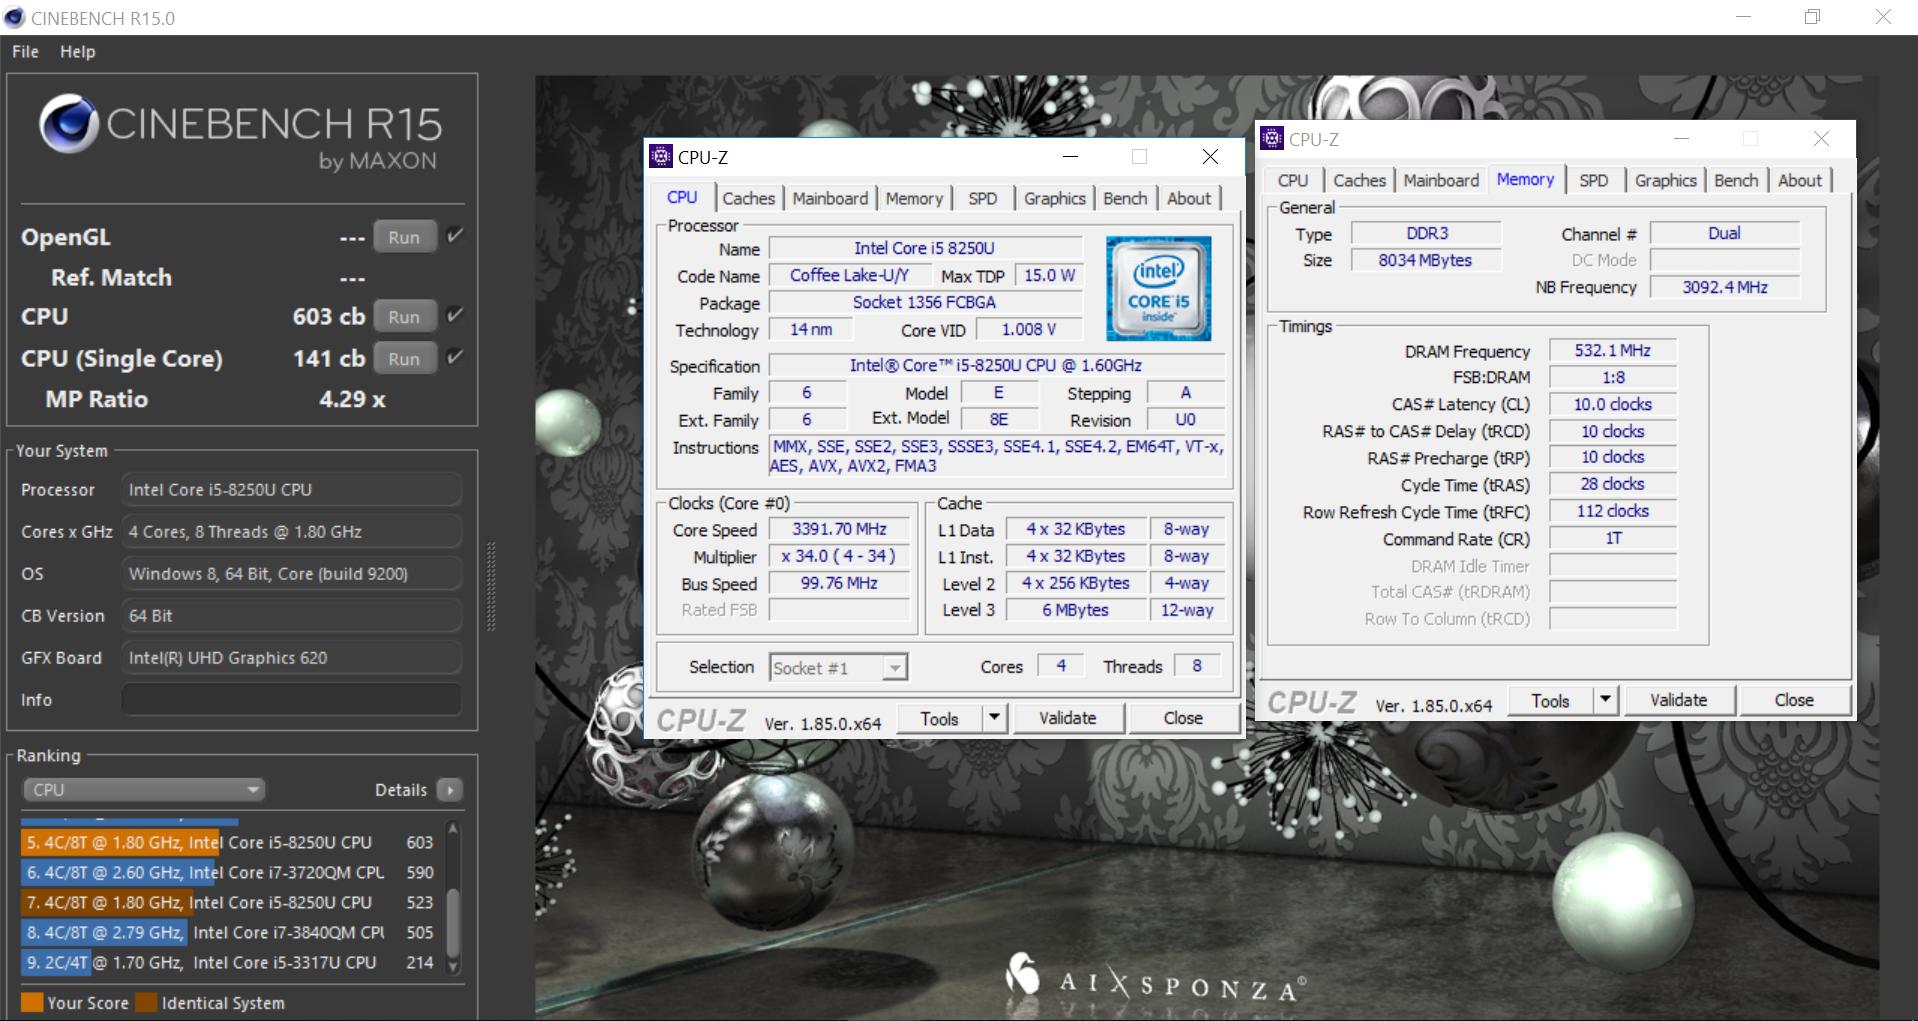 Maisi`s Cinebench - R15 score: 603 cb with a Core i5 8250U